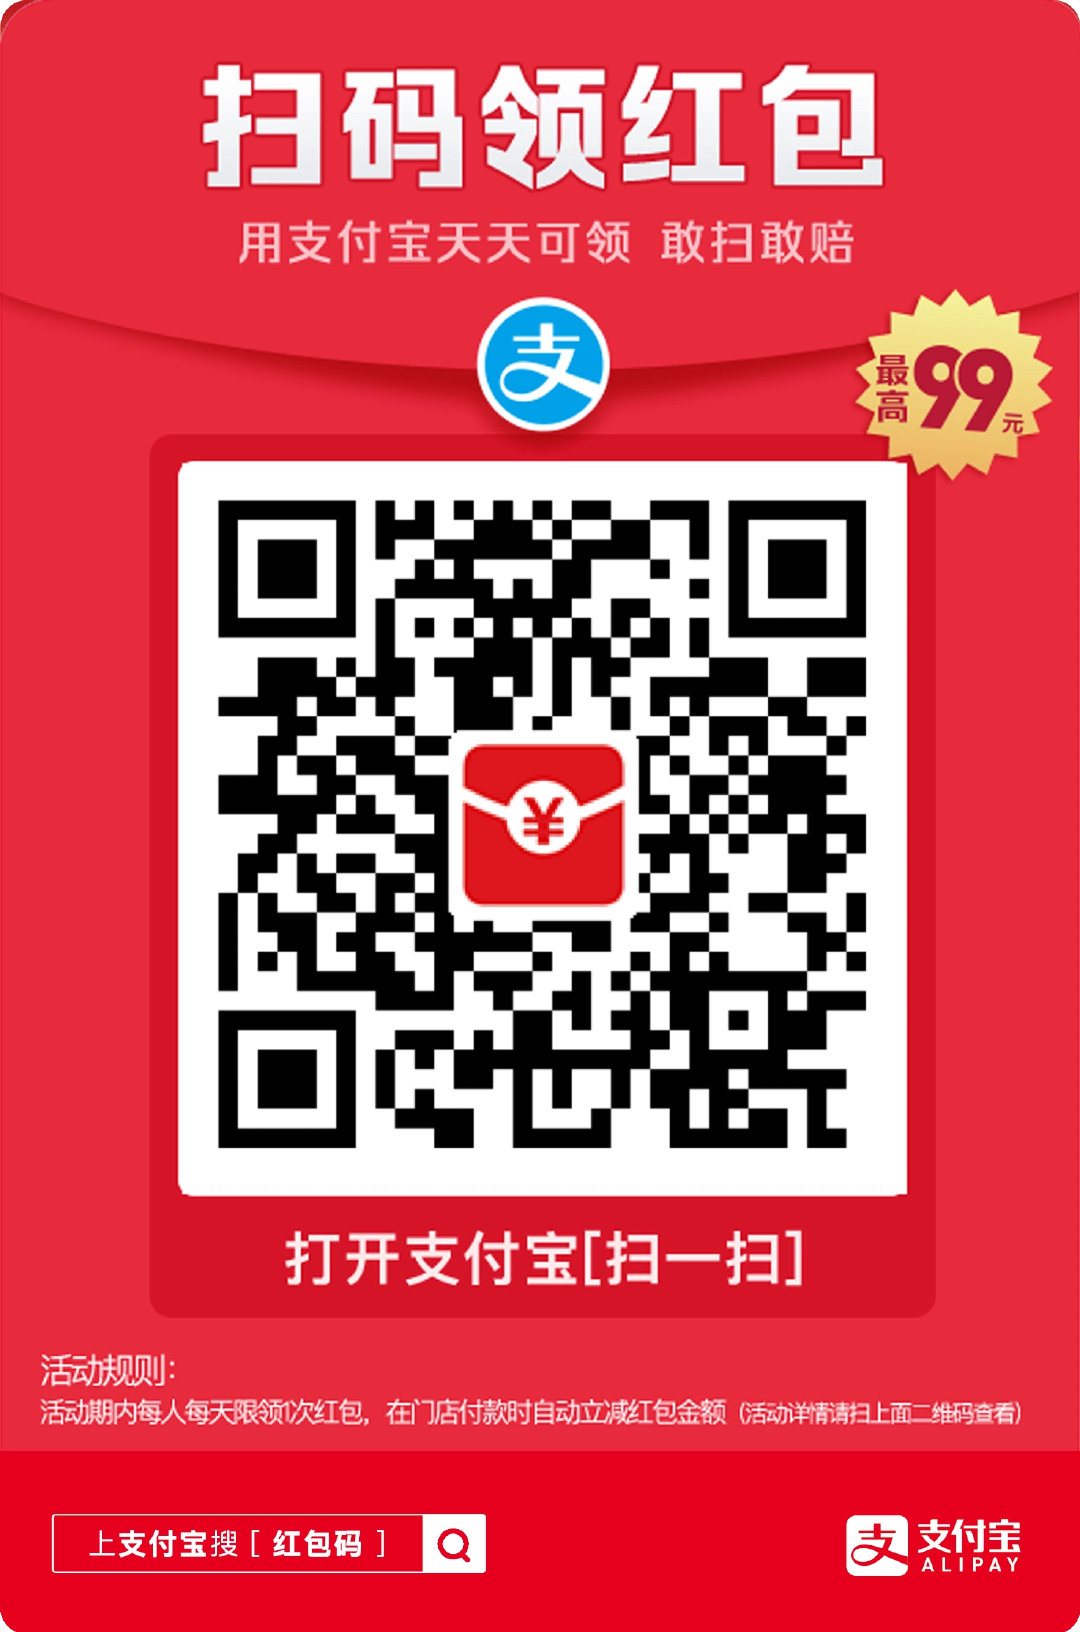 app下载_nfc